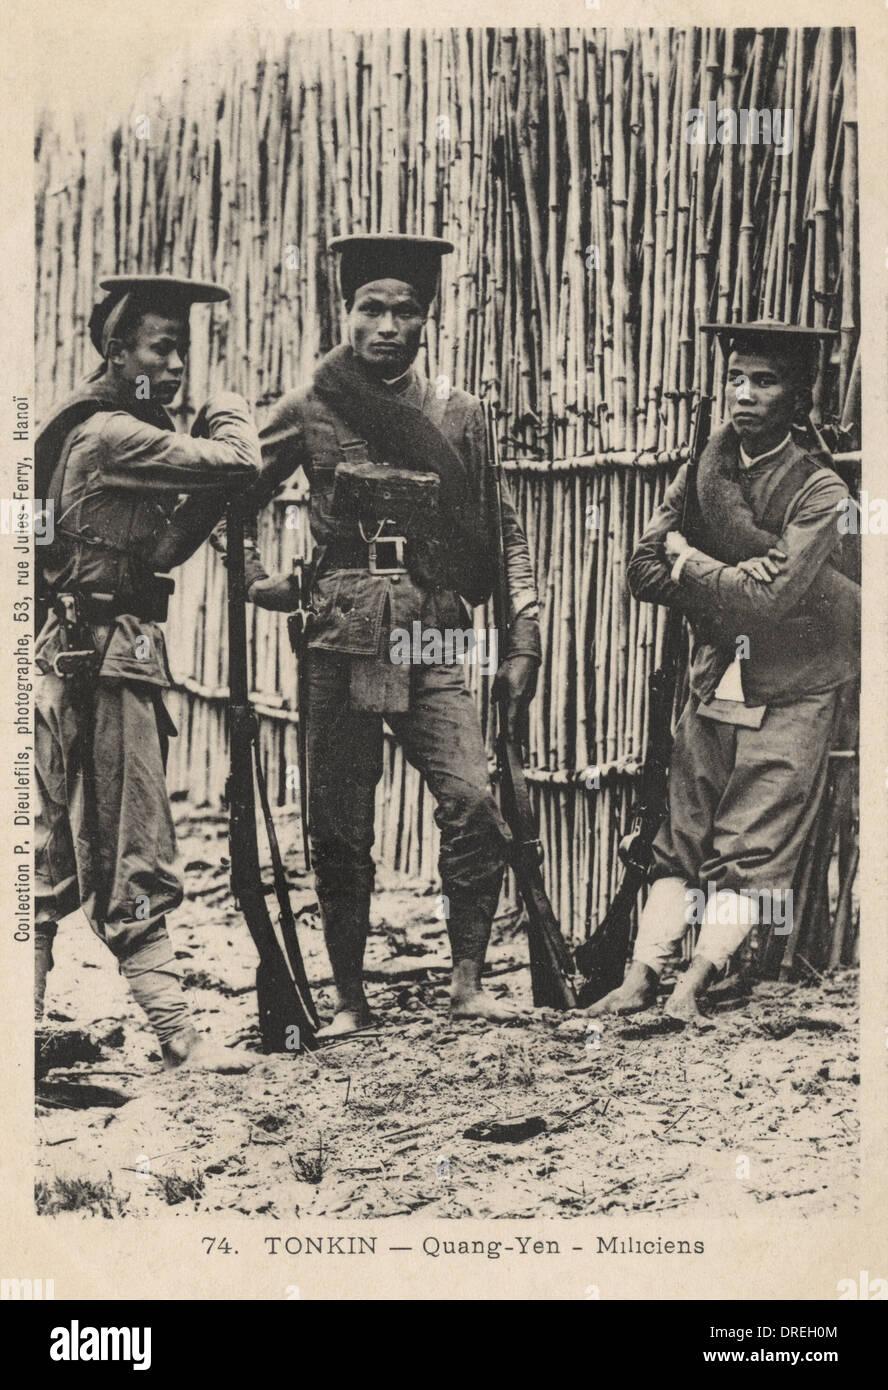 Tonkin, North Vietnam - Quang Yen - Militia - Stock Image